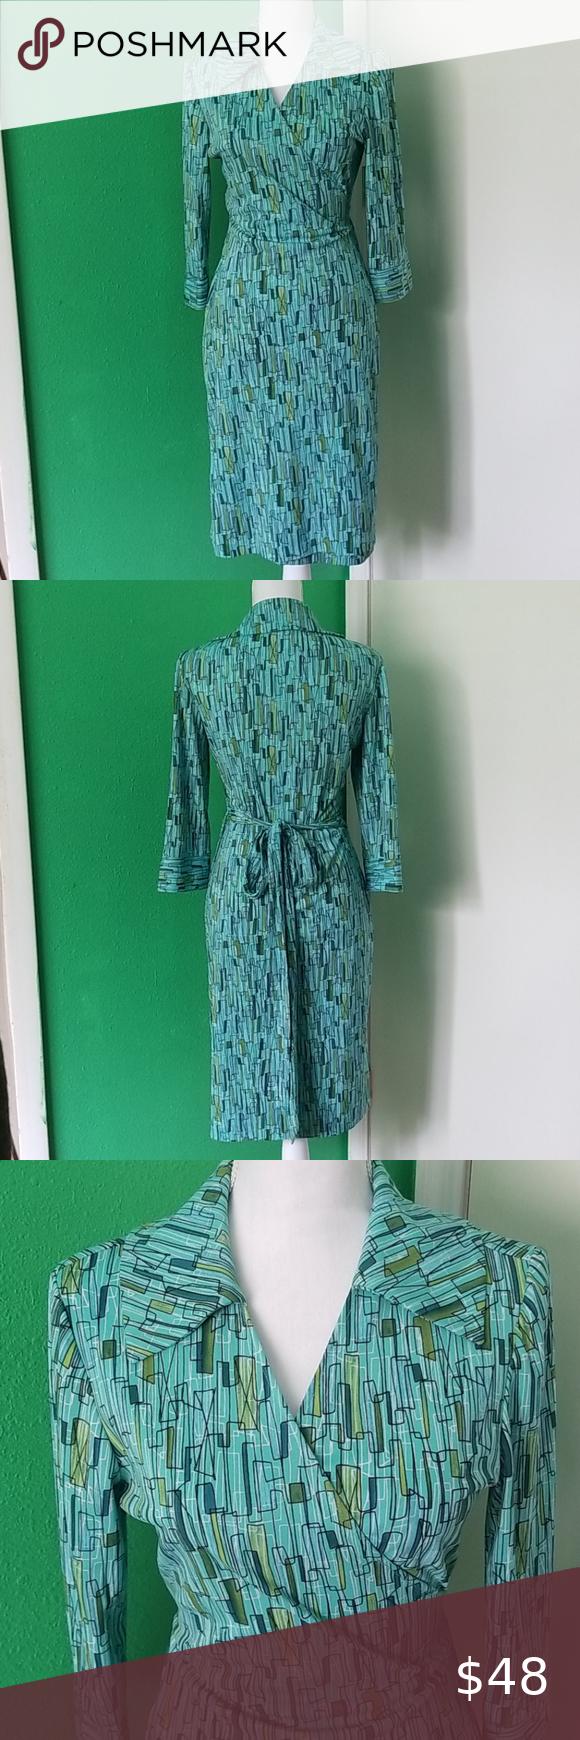 Atomic Age Rockabilly Vintage Wrap Dress Vintage Wrap Dress Vintage Wraps Wrap Dress [ 1740 x 580 Pixel ]